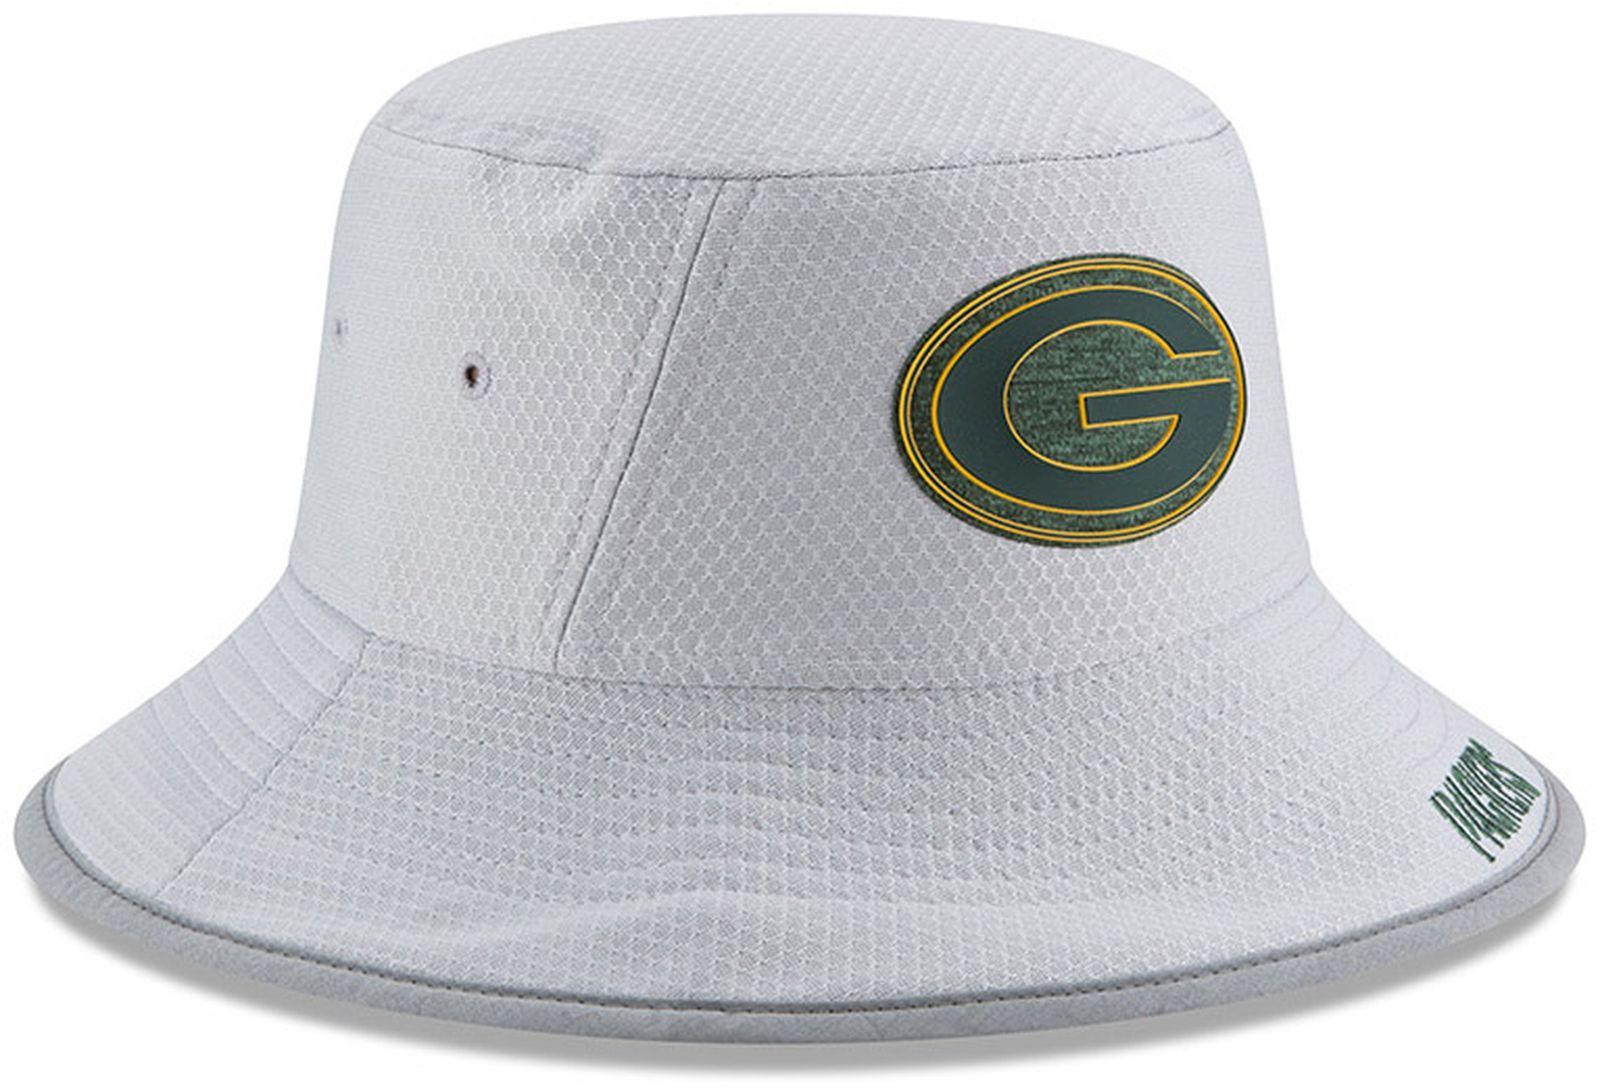 ... Vorschau  New Era - NFL Green Bay Packers On Field 2018 Training Bucket  Hat Hut ... 26c6da6d473c